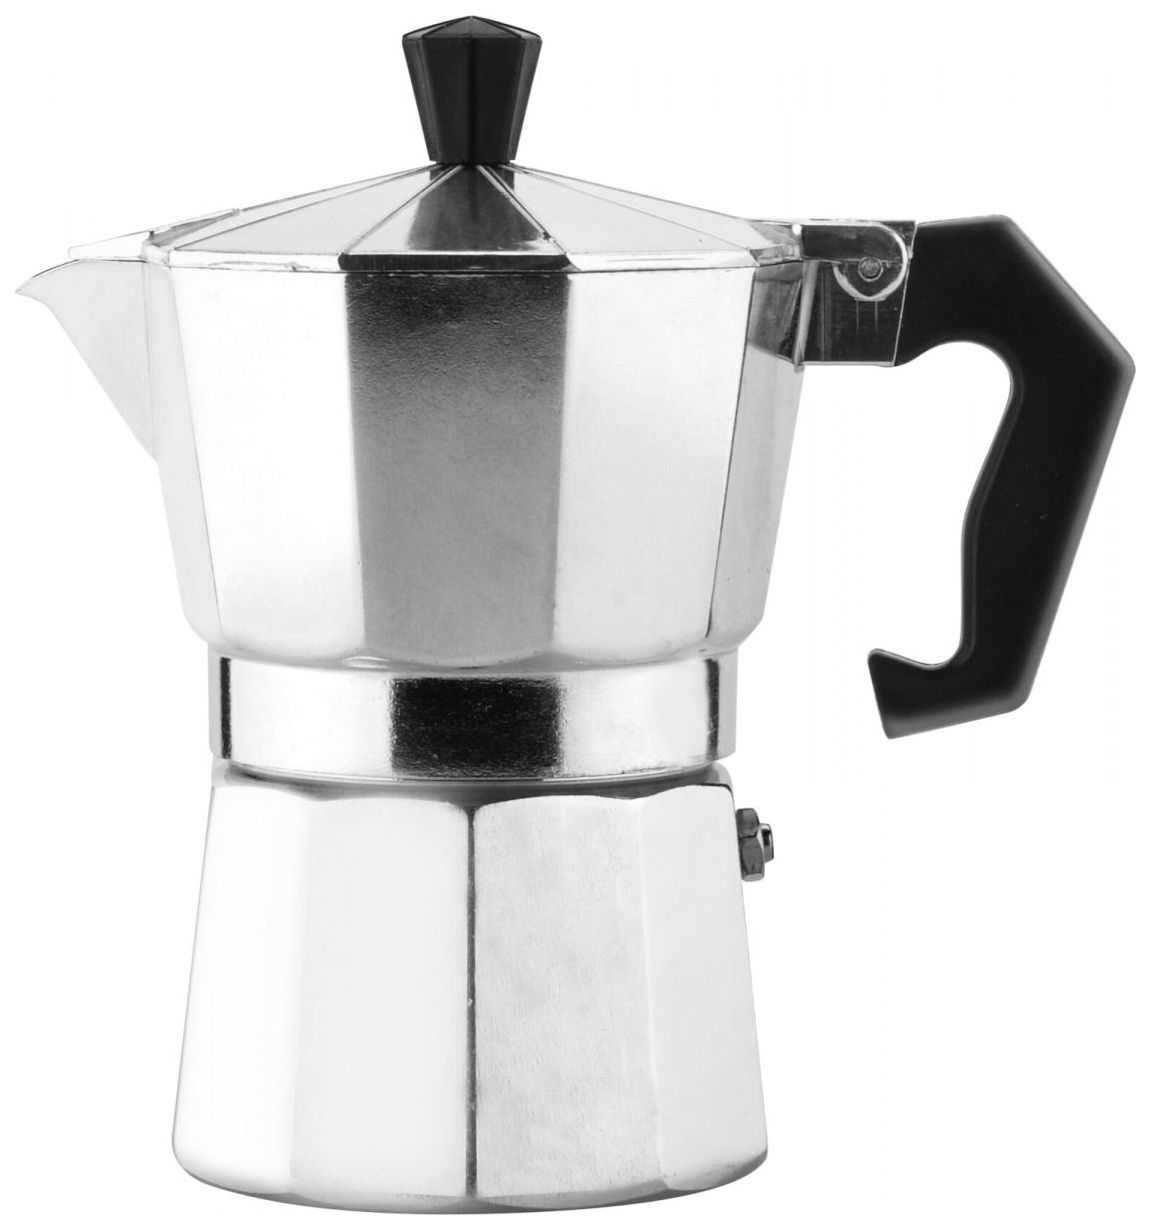 Кофеварка гейзерная Mallony Grande, 120мл, 3 чашки, алюминий, 4262